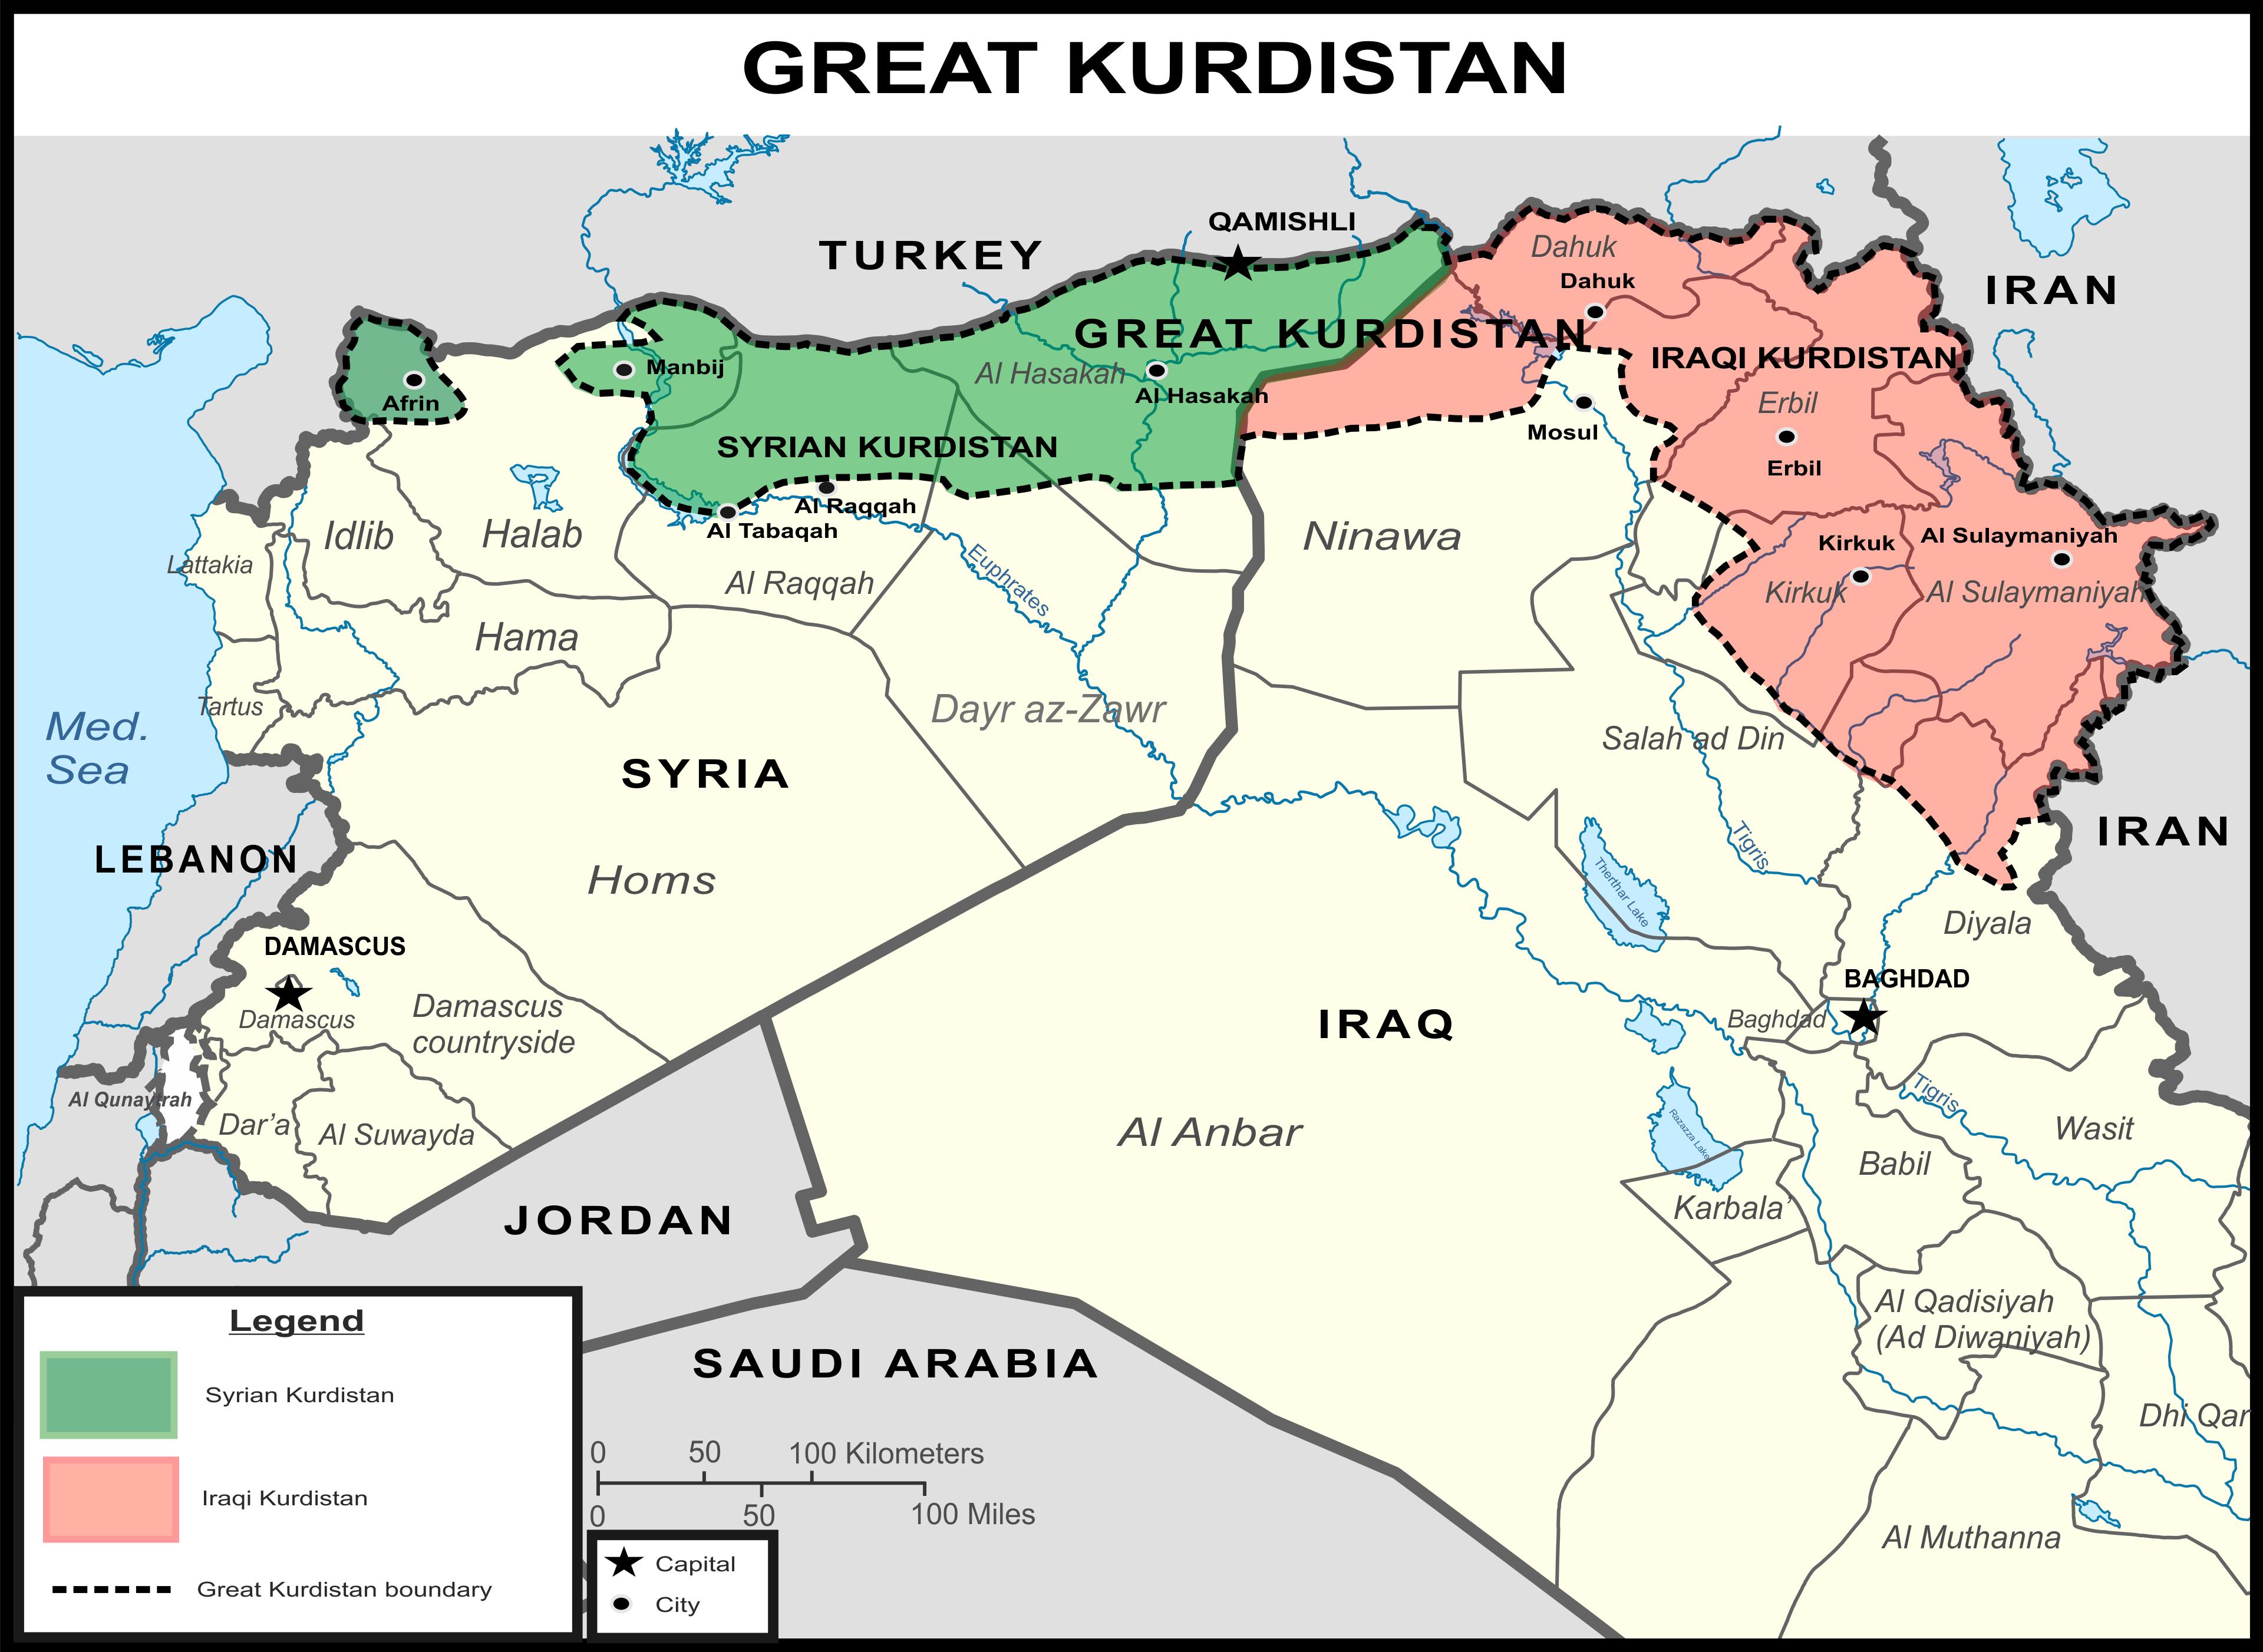 Washington Sponsored State of Great Kurdistan To Be Created in